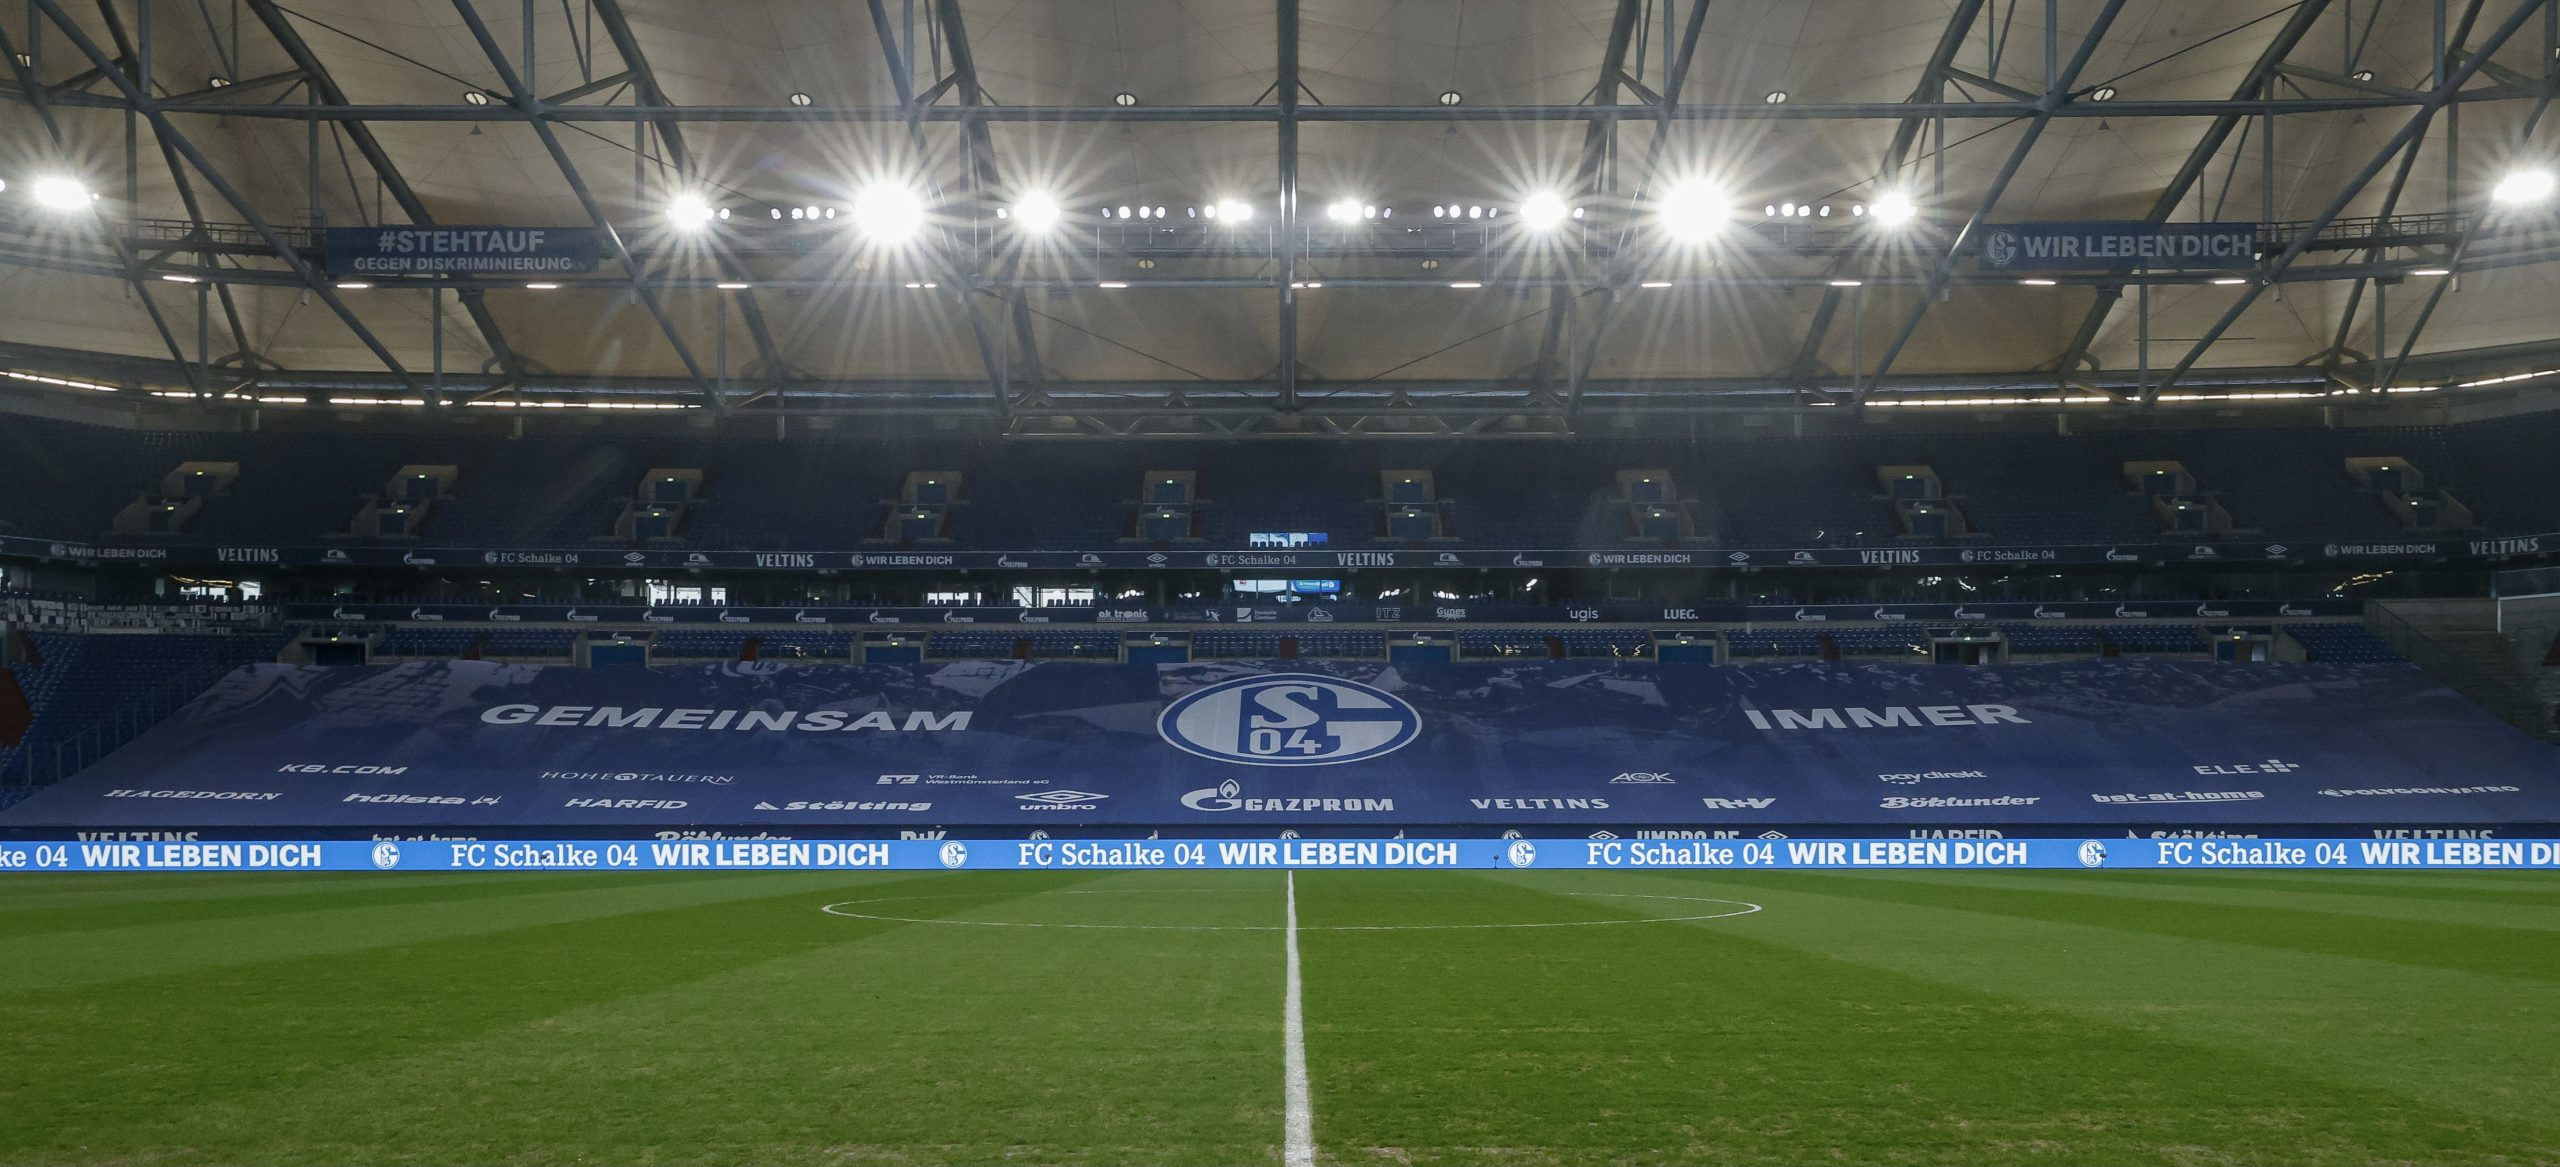 FC Schalke 04, TSG 1899 Hoffenheim, Saison 2020/2021, Bundesliga, 9.01.202, Großformat, Großformatbanner